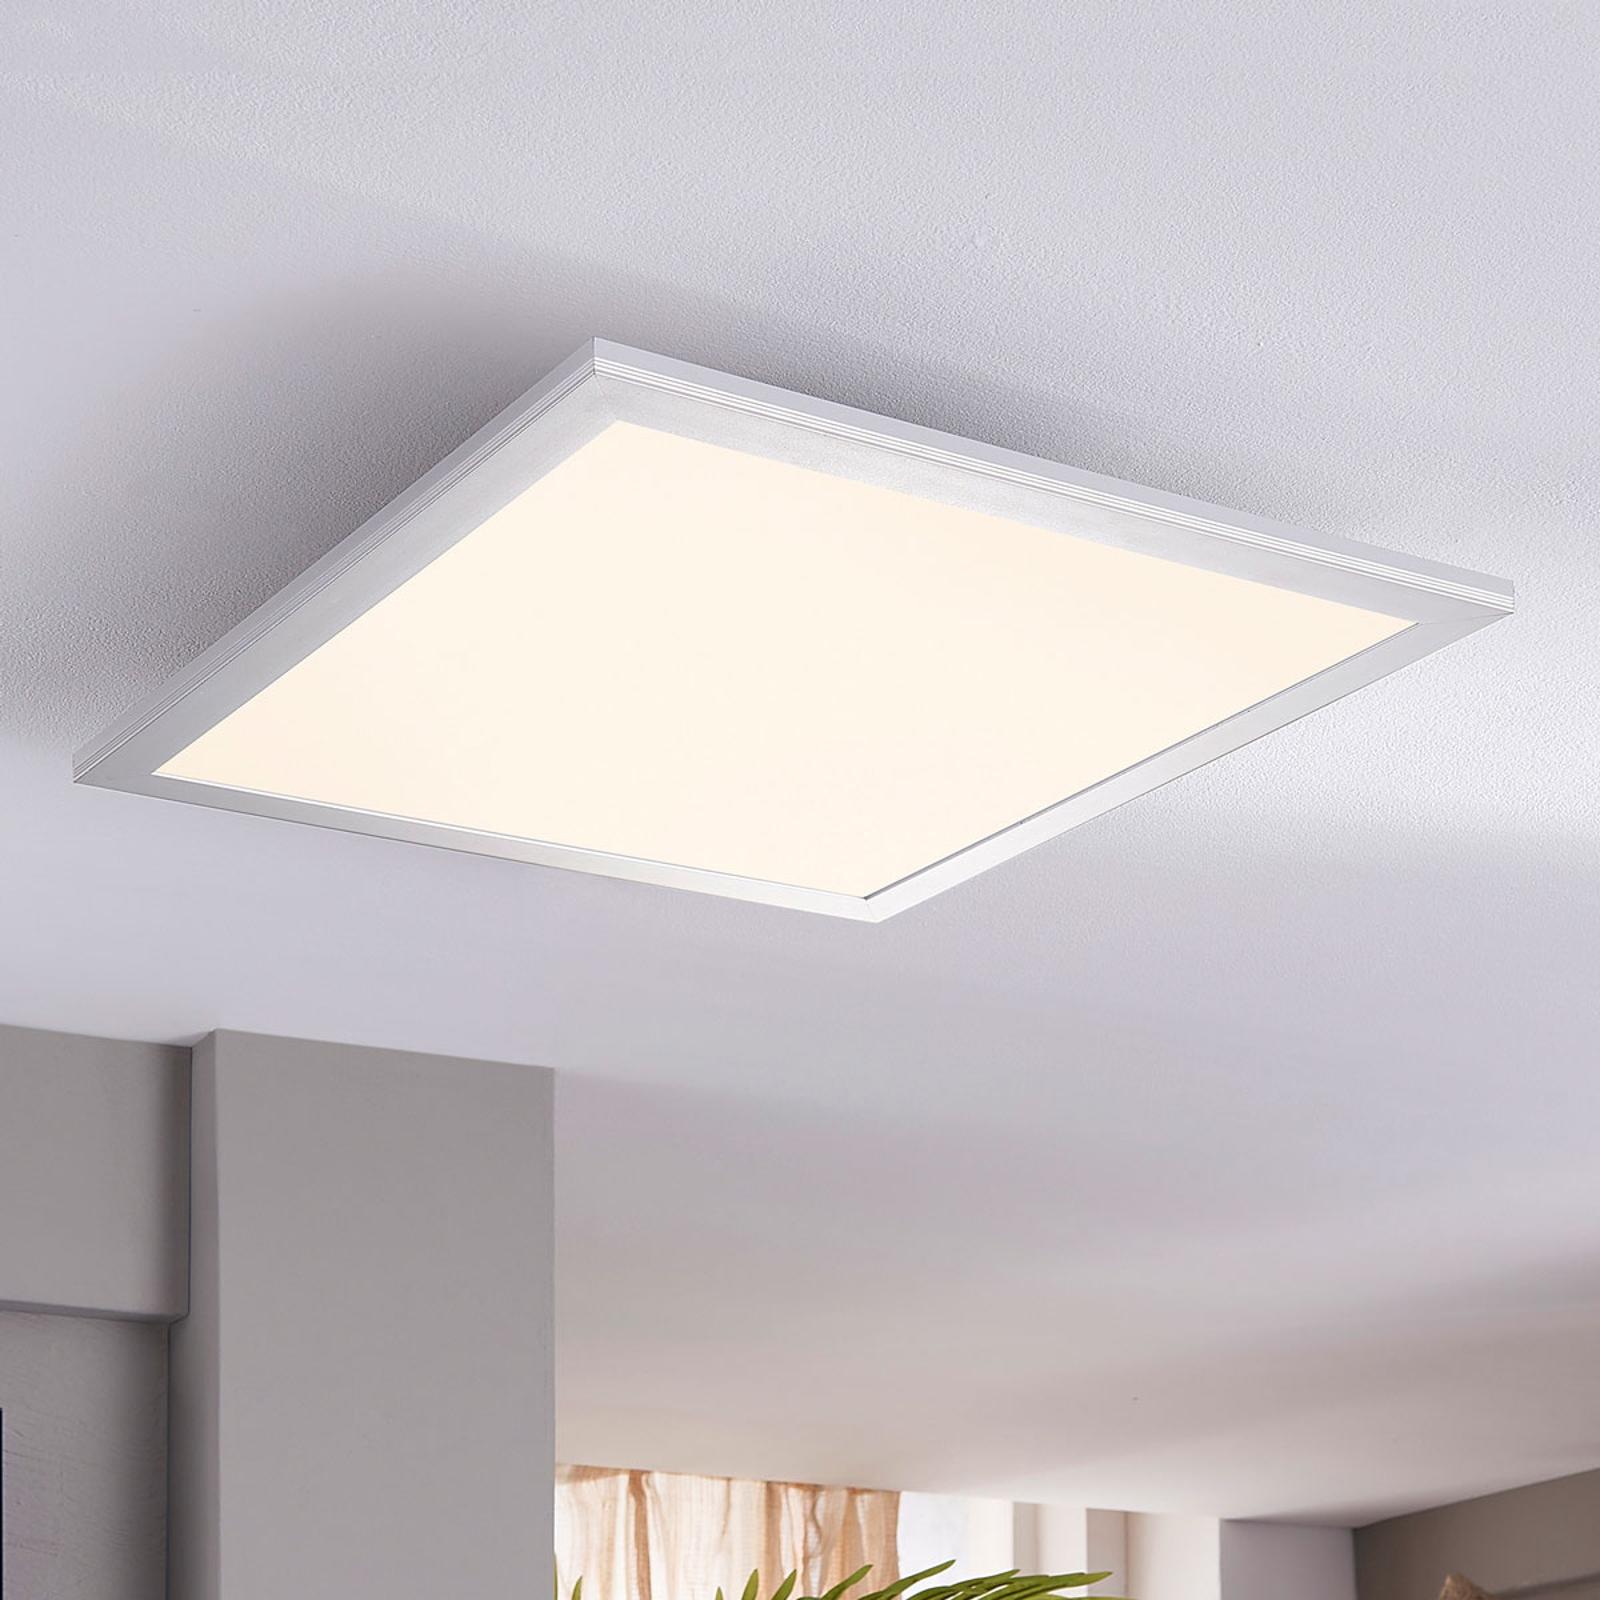 Lindby Livel LED panel, 4,000 K, 40 cm x 40 cm_9956001_1